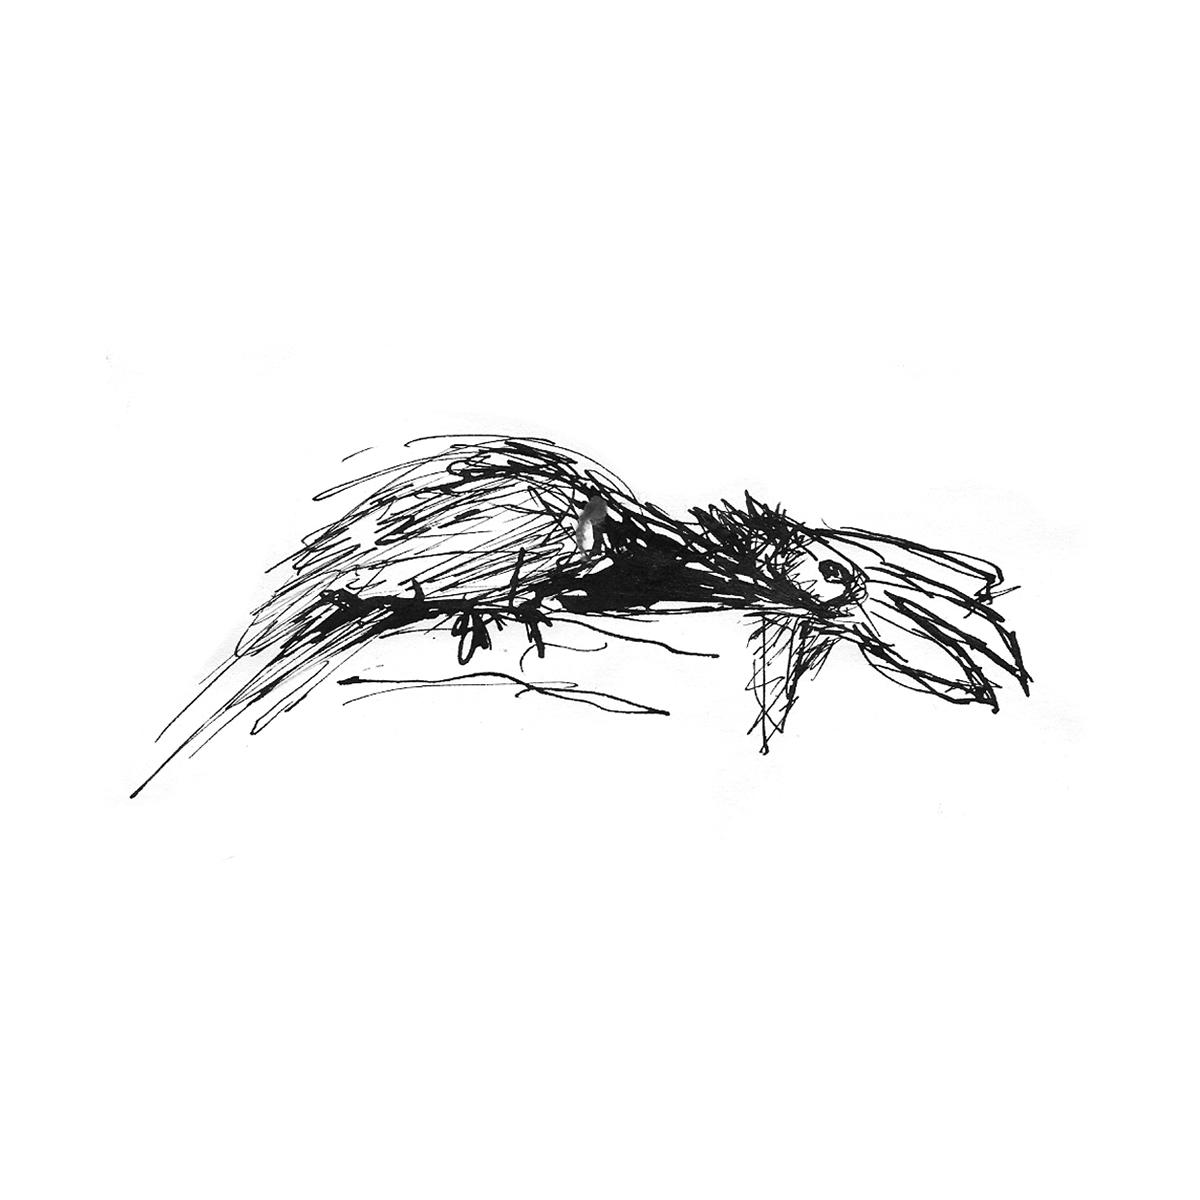 ink animals iIllustration skatchies fastdrawing zoo bird elephant vulture parrot blackandwhite